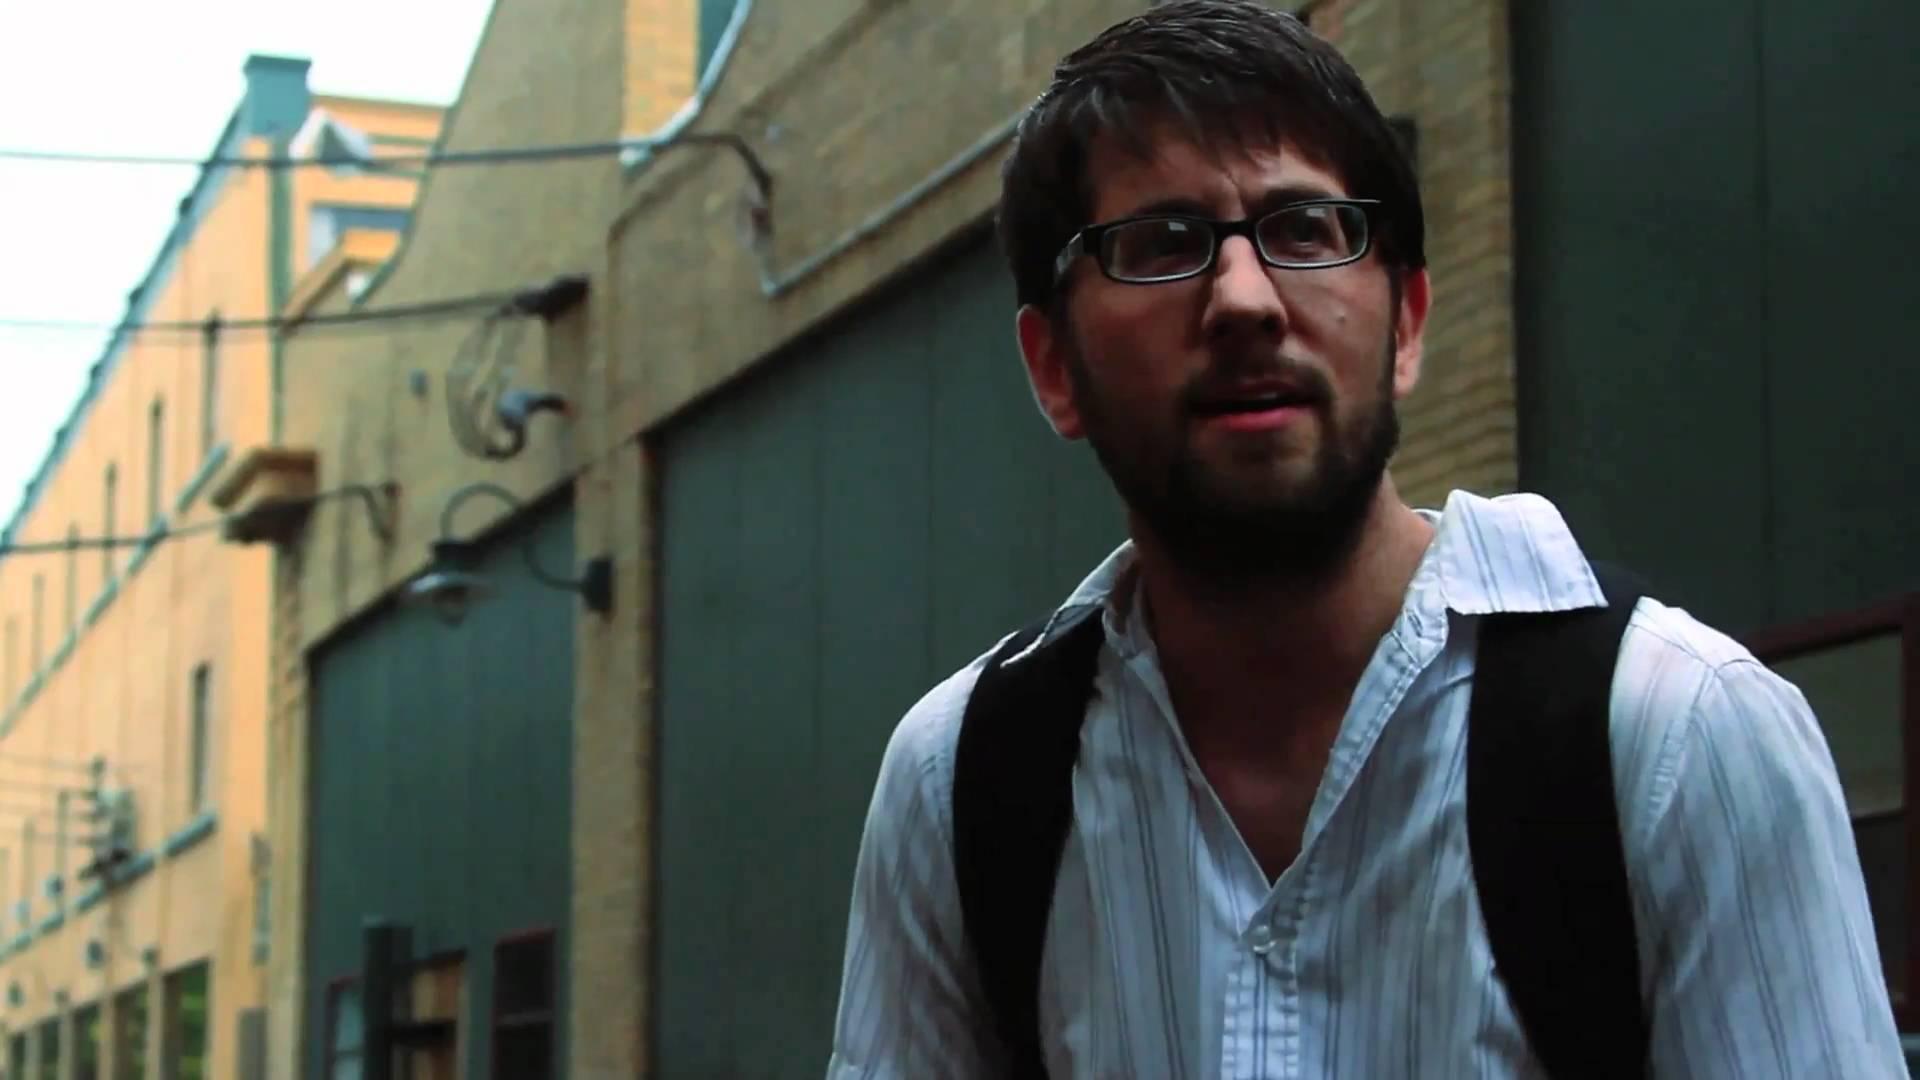 Post-Apocalyptic Zombie Shotgun Madness - Film Festival Edition